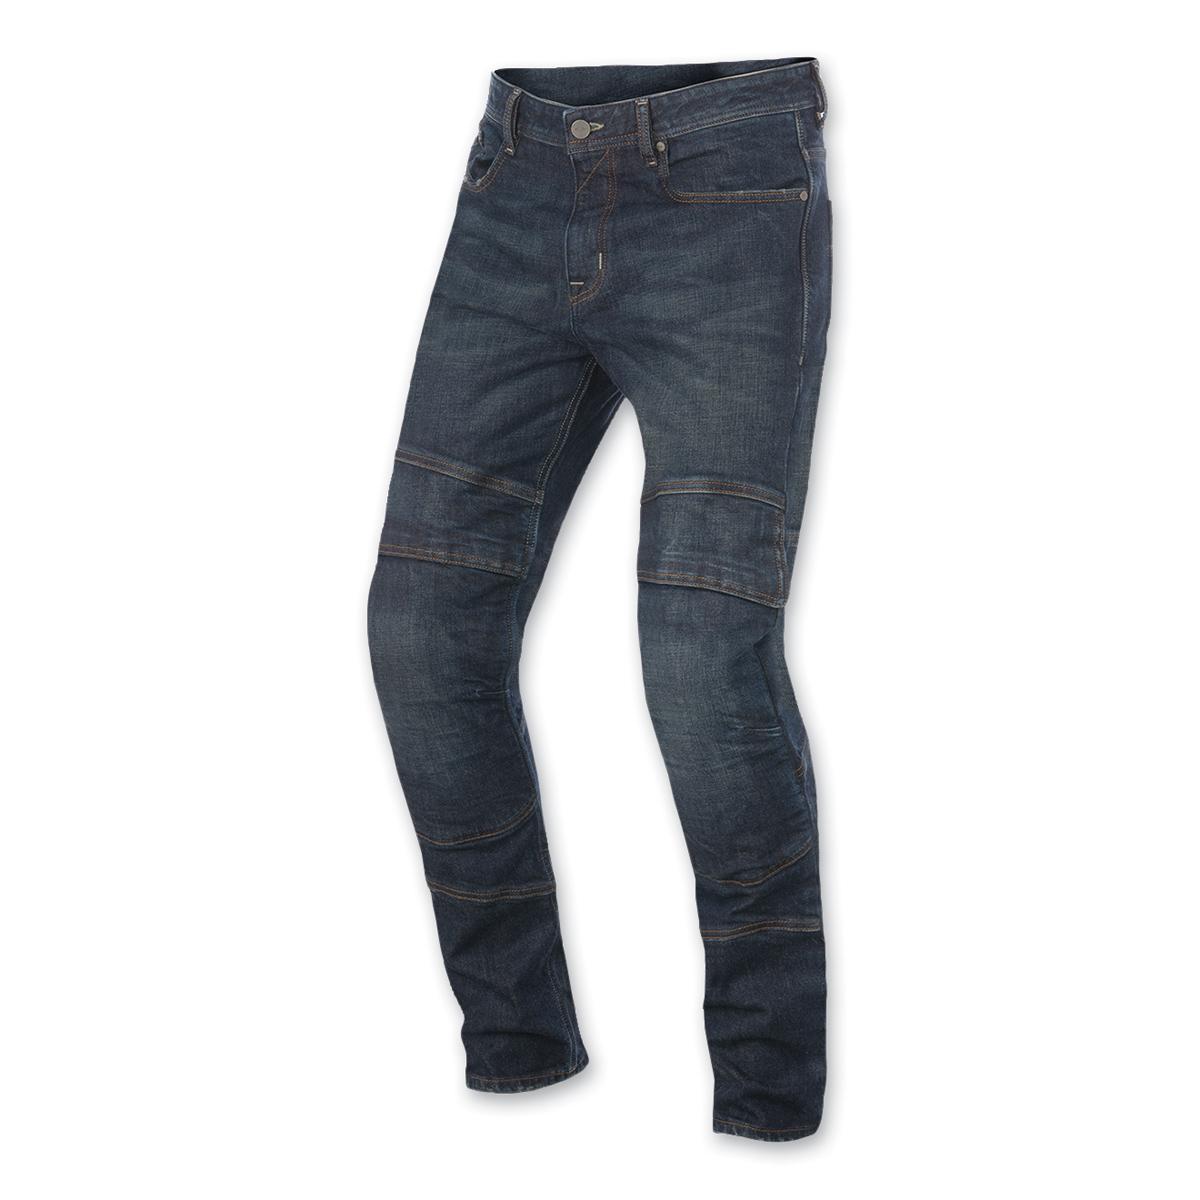 Alpinestars Men's Crank Greaser Dirty Denim Pants